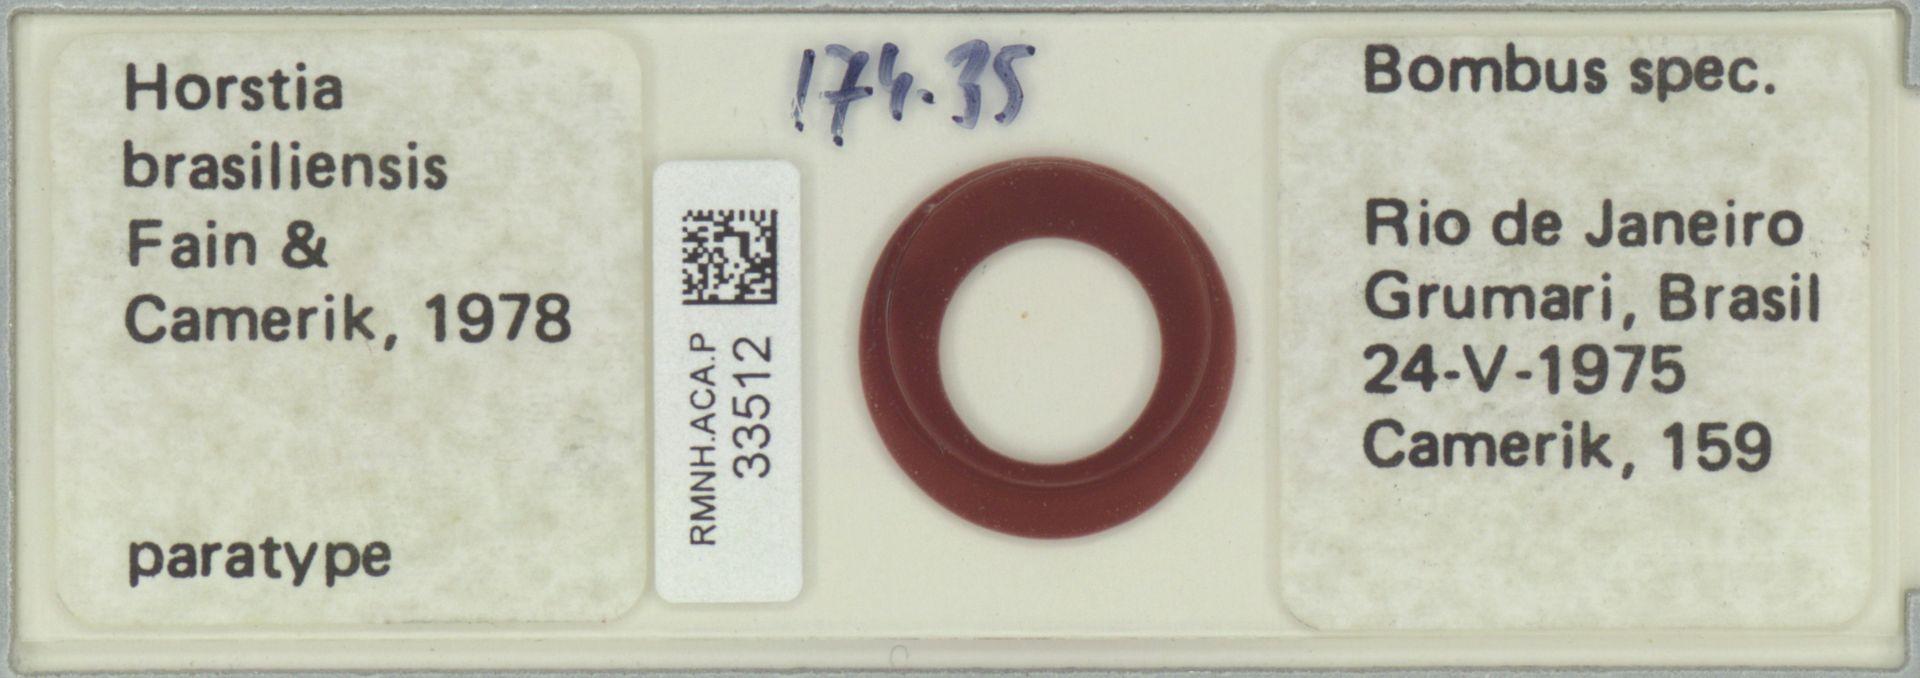 RMNH.ACA.P.33512 | Horstia brasiliensis Fain & Camerik, 1978